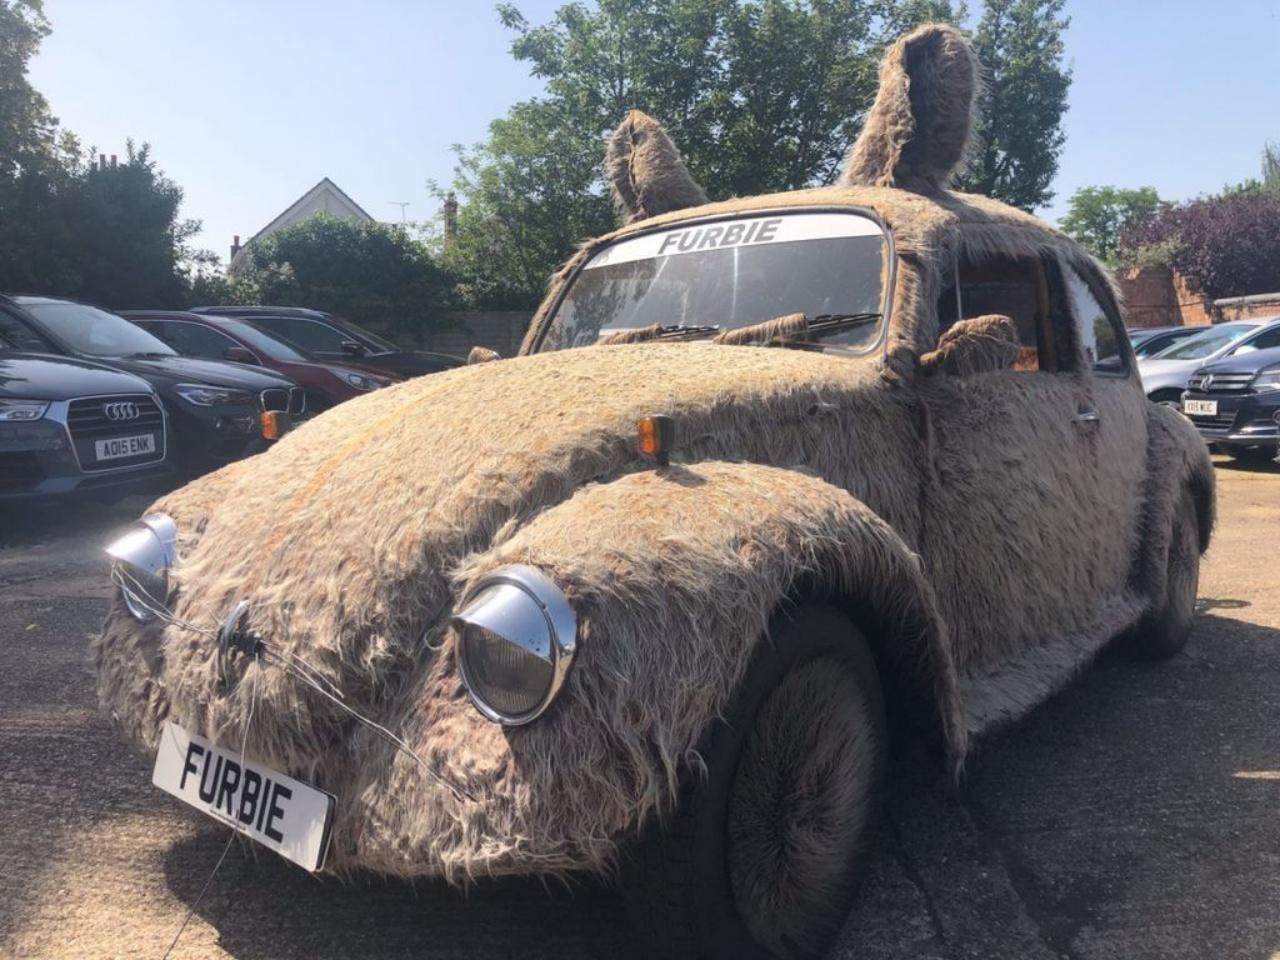 Volkswagen-Beetle-Furbie-1978-17